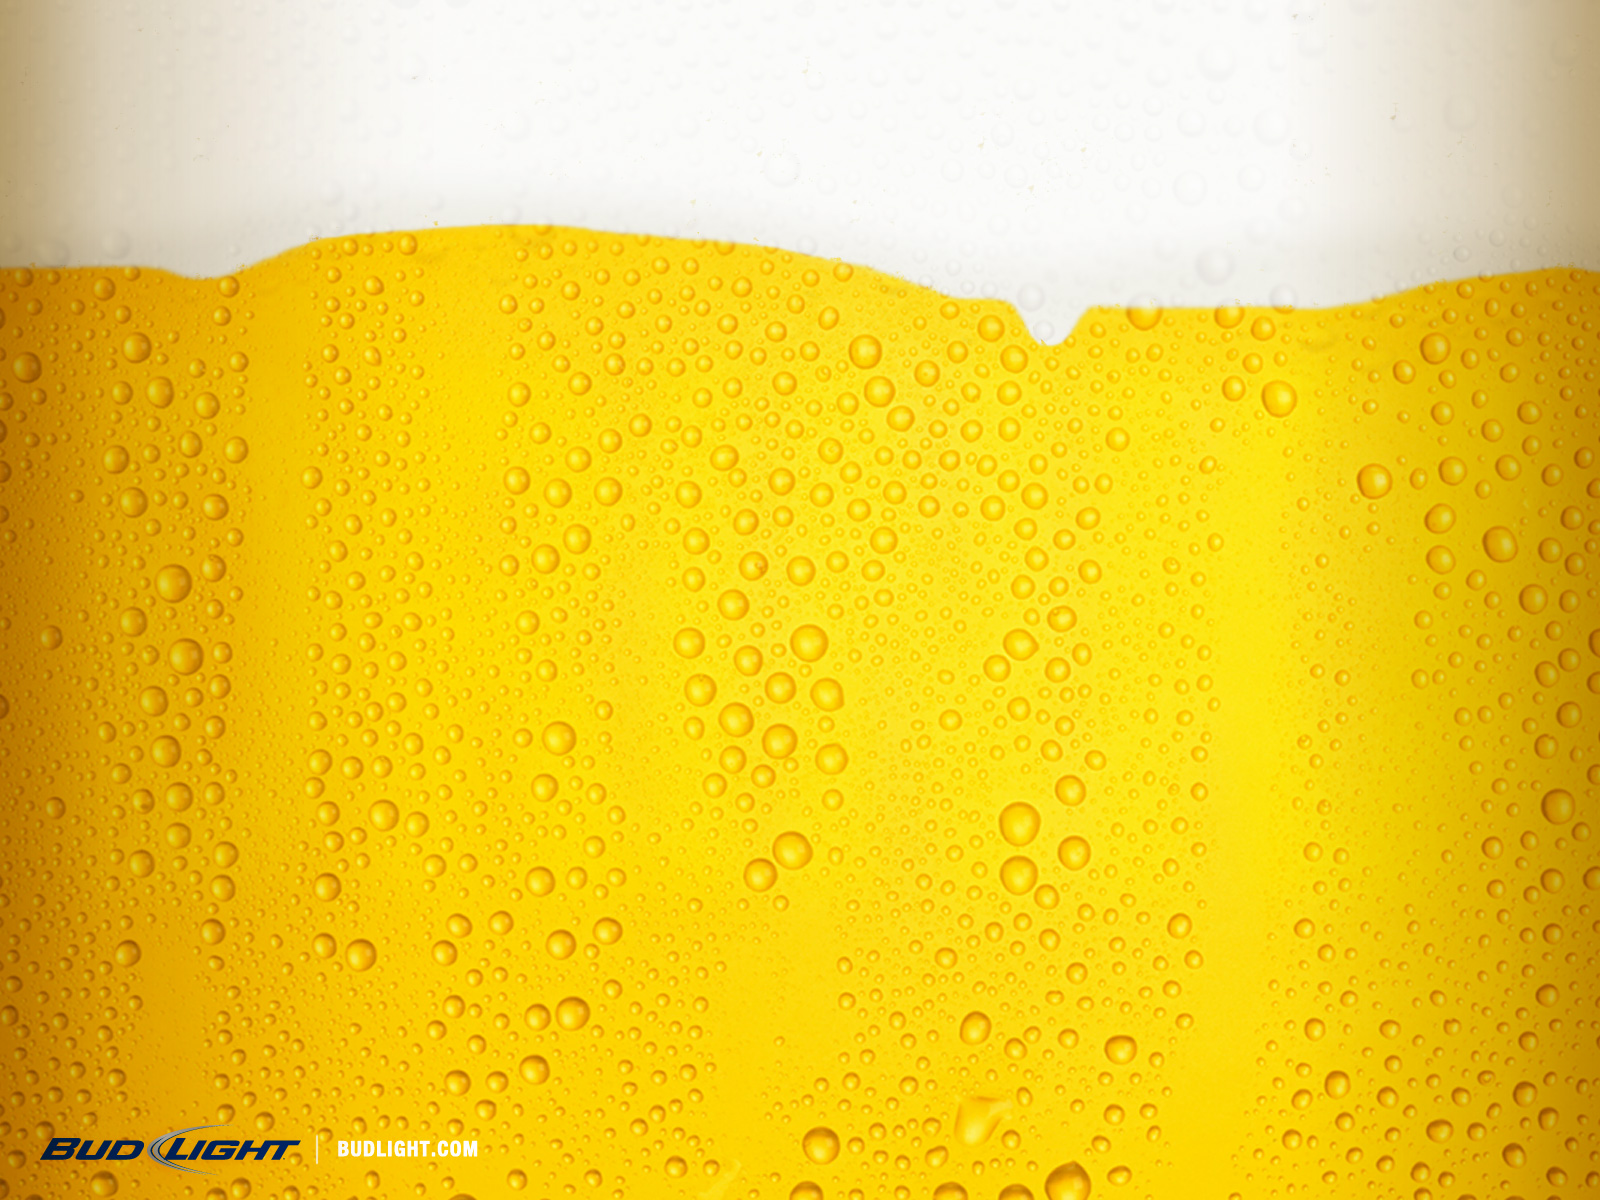 Bud Light Wallpaper Wallpaper Full HD 1600x1200